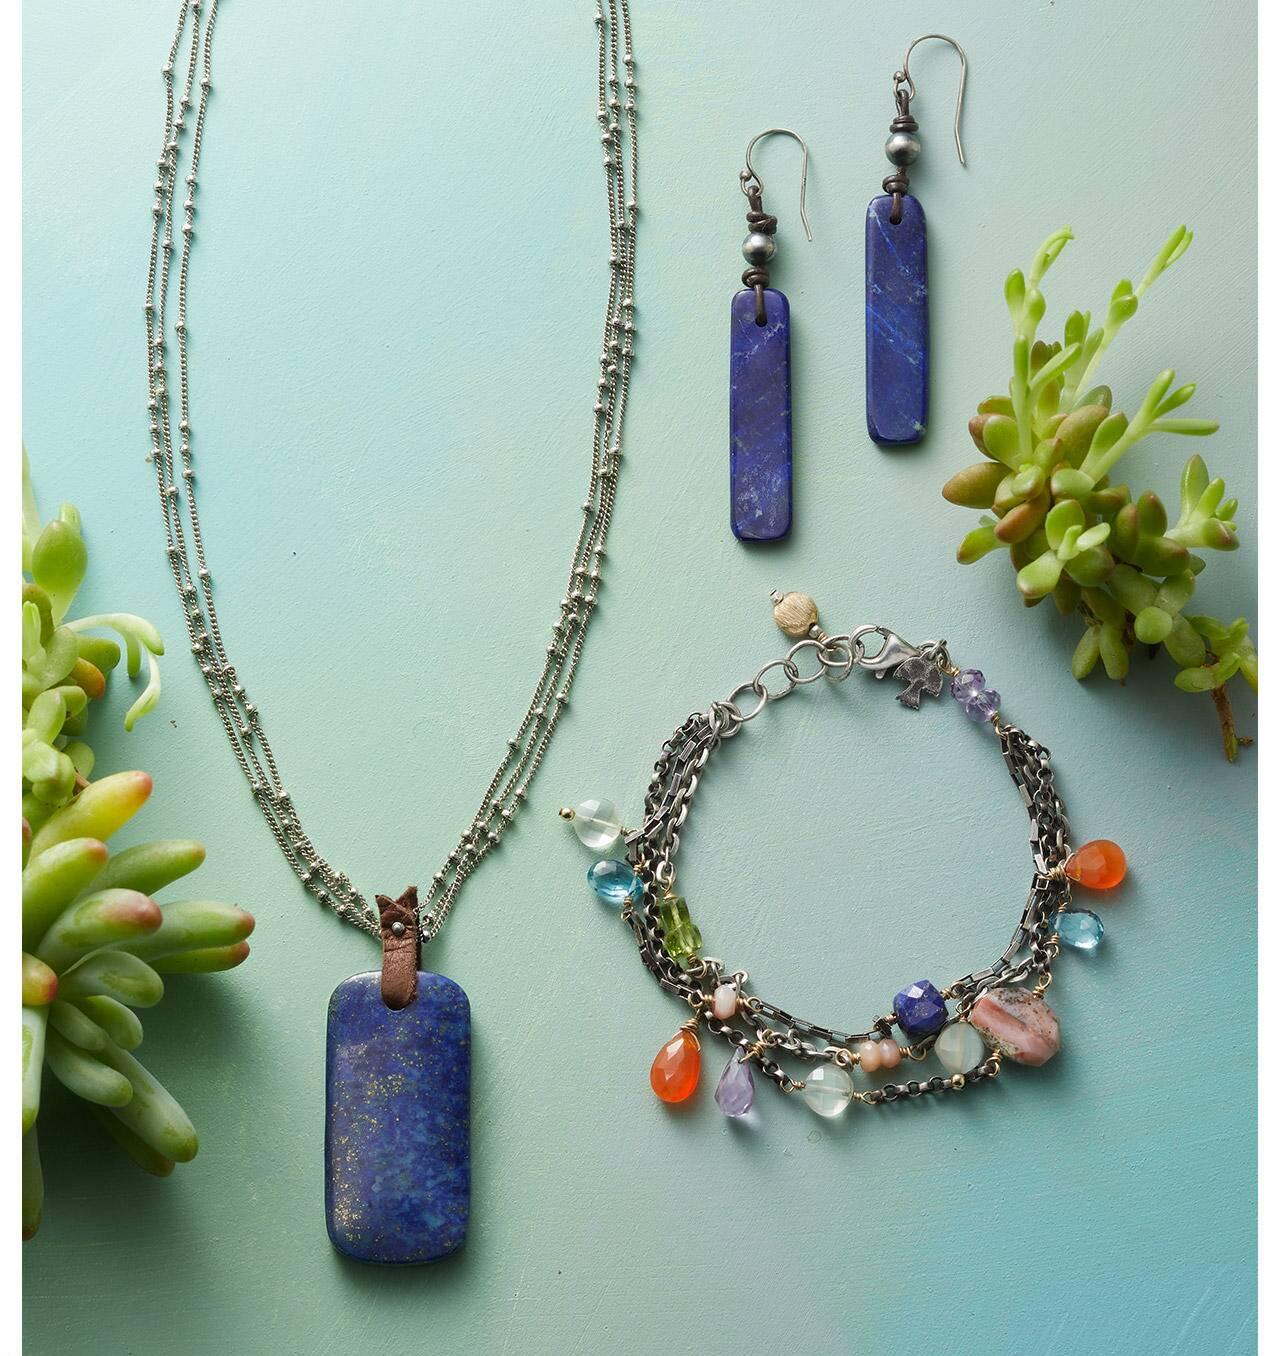 Jewelry with a Casual Twist